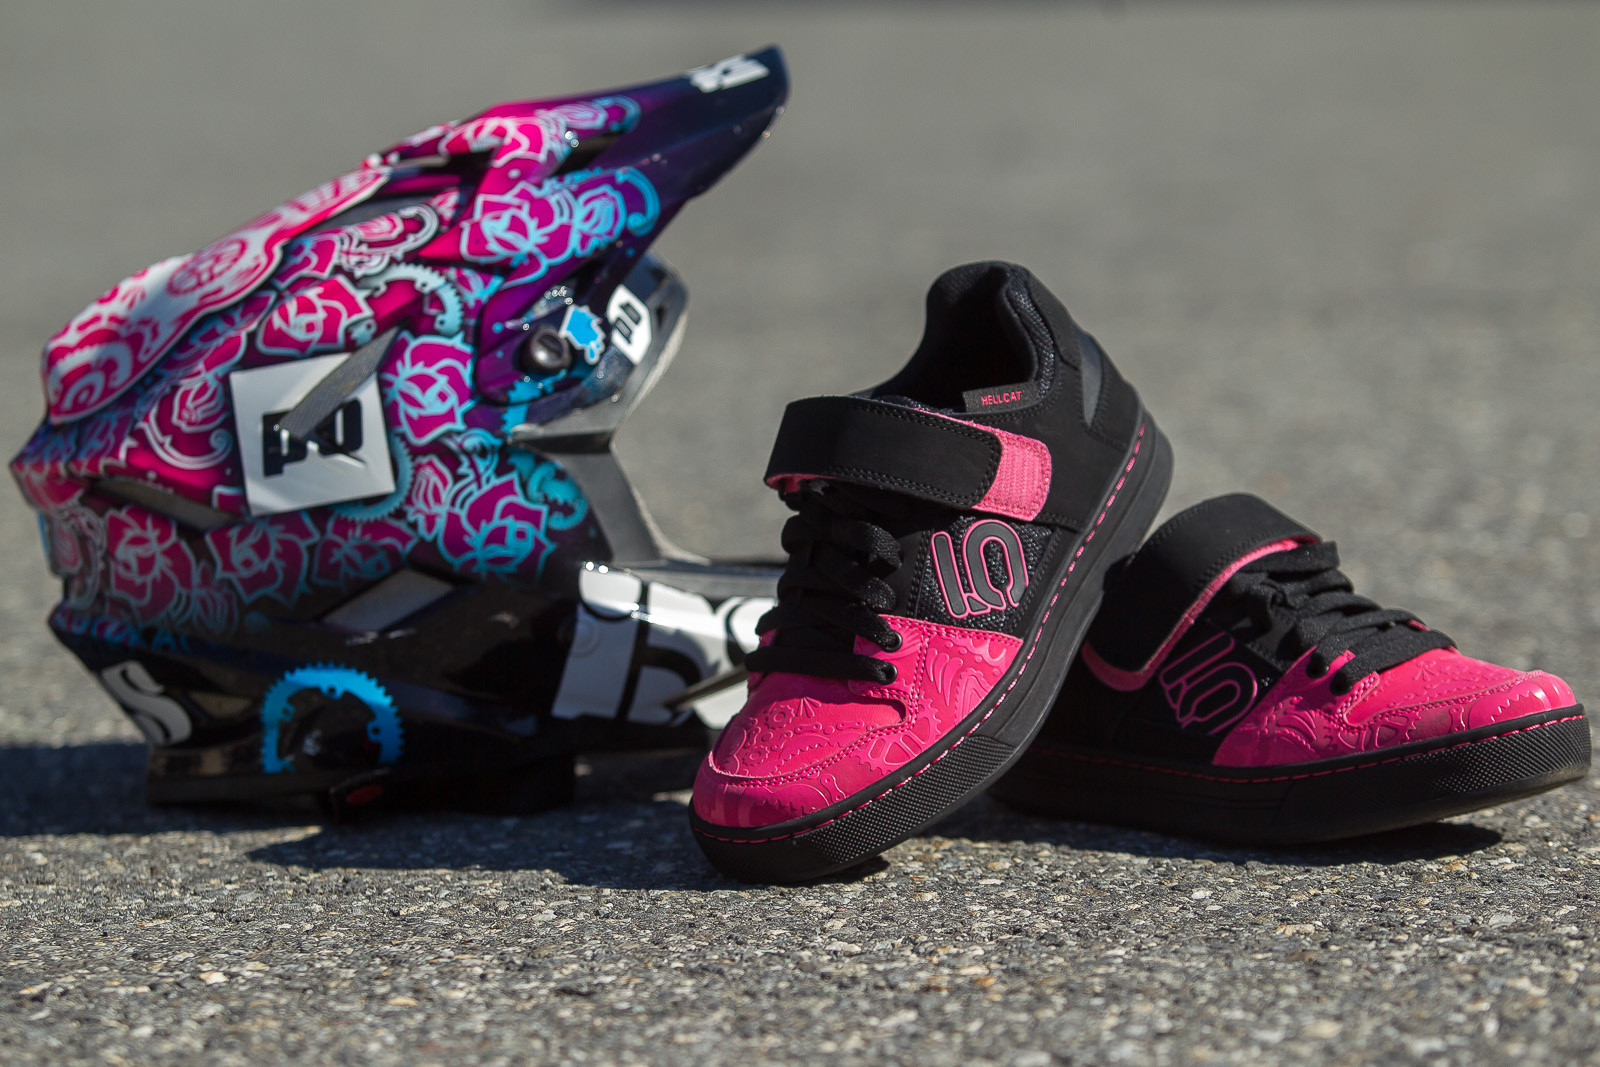 Tracey Hannah's Custom Five Ten Hellcat Shoes - PIT BITS - World Cup Lenzerheide, Switzerland - Mountain Biking Pictures - Vital MTB